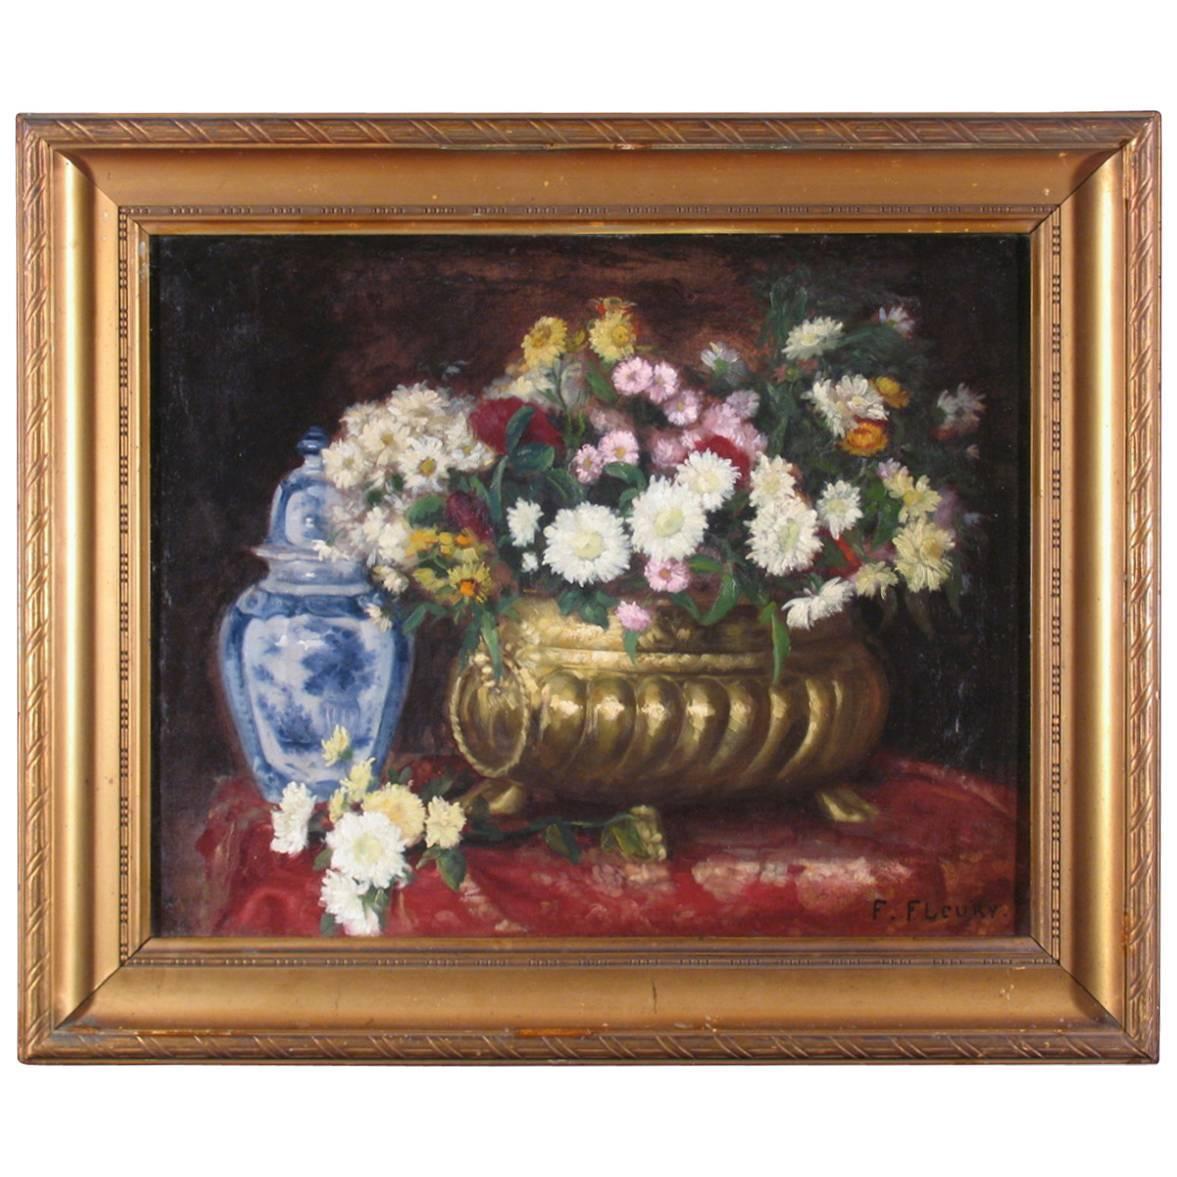 19th Century French Flower Still Life